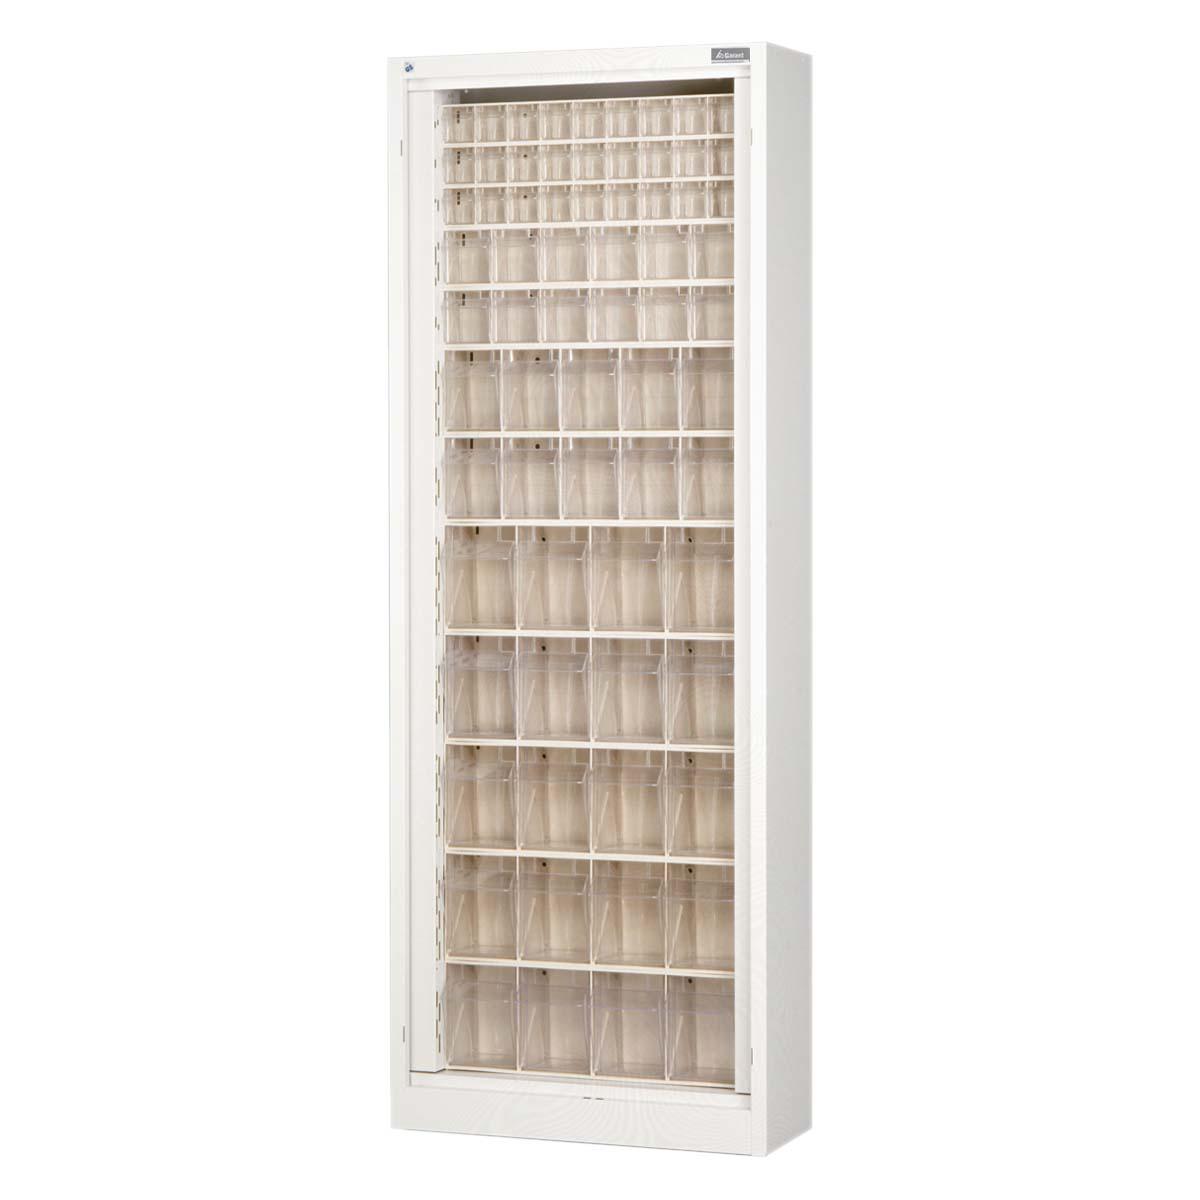 garant armoire sans portes 45 garant. Black Bedroom Furniture Sets. Home Design Ideas